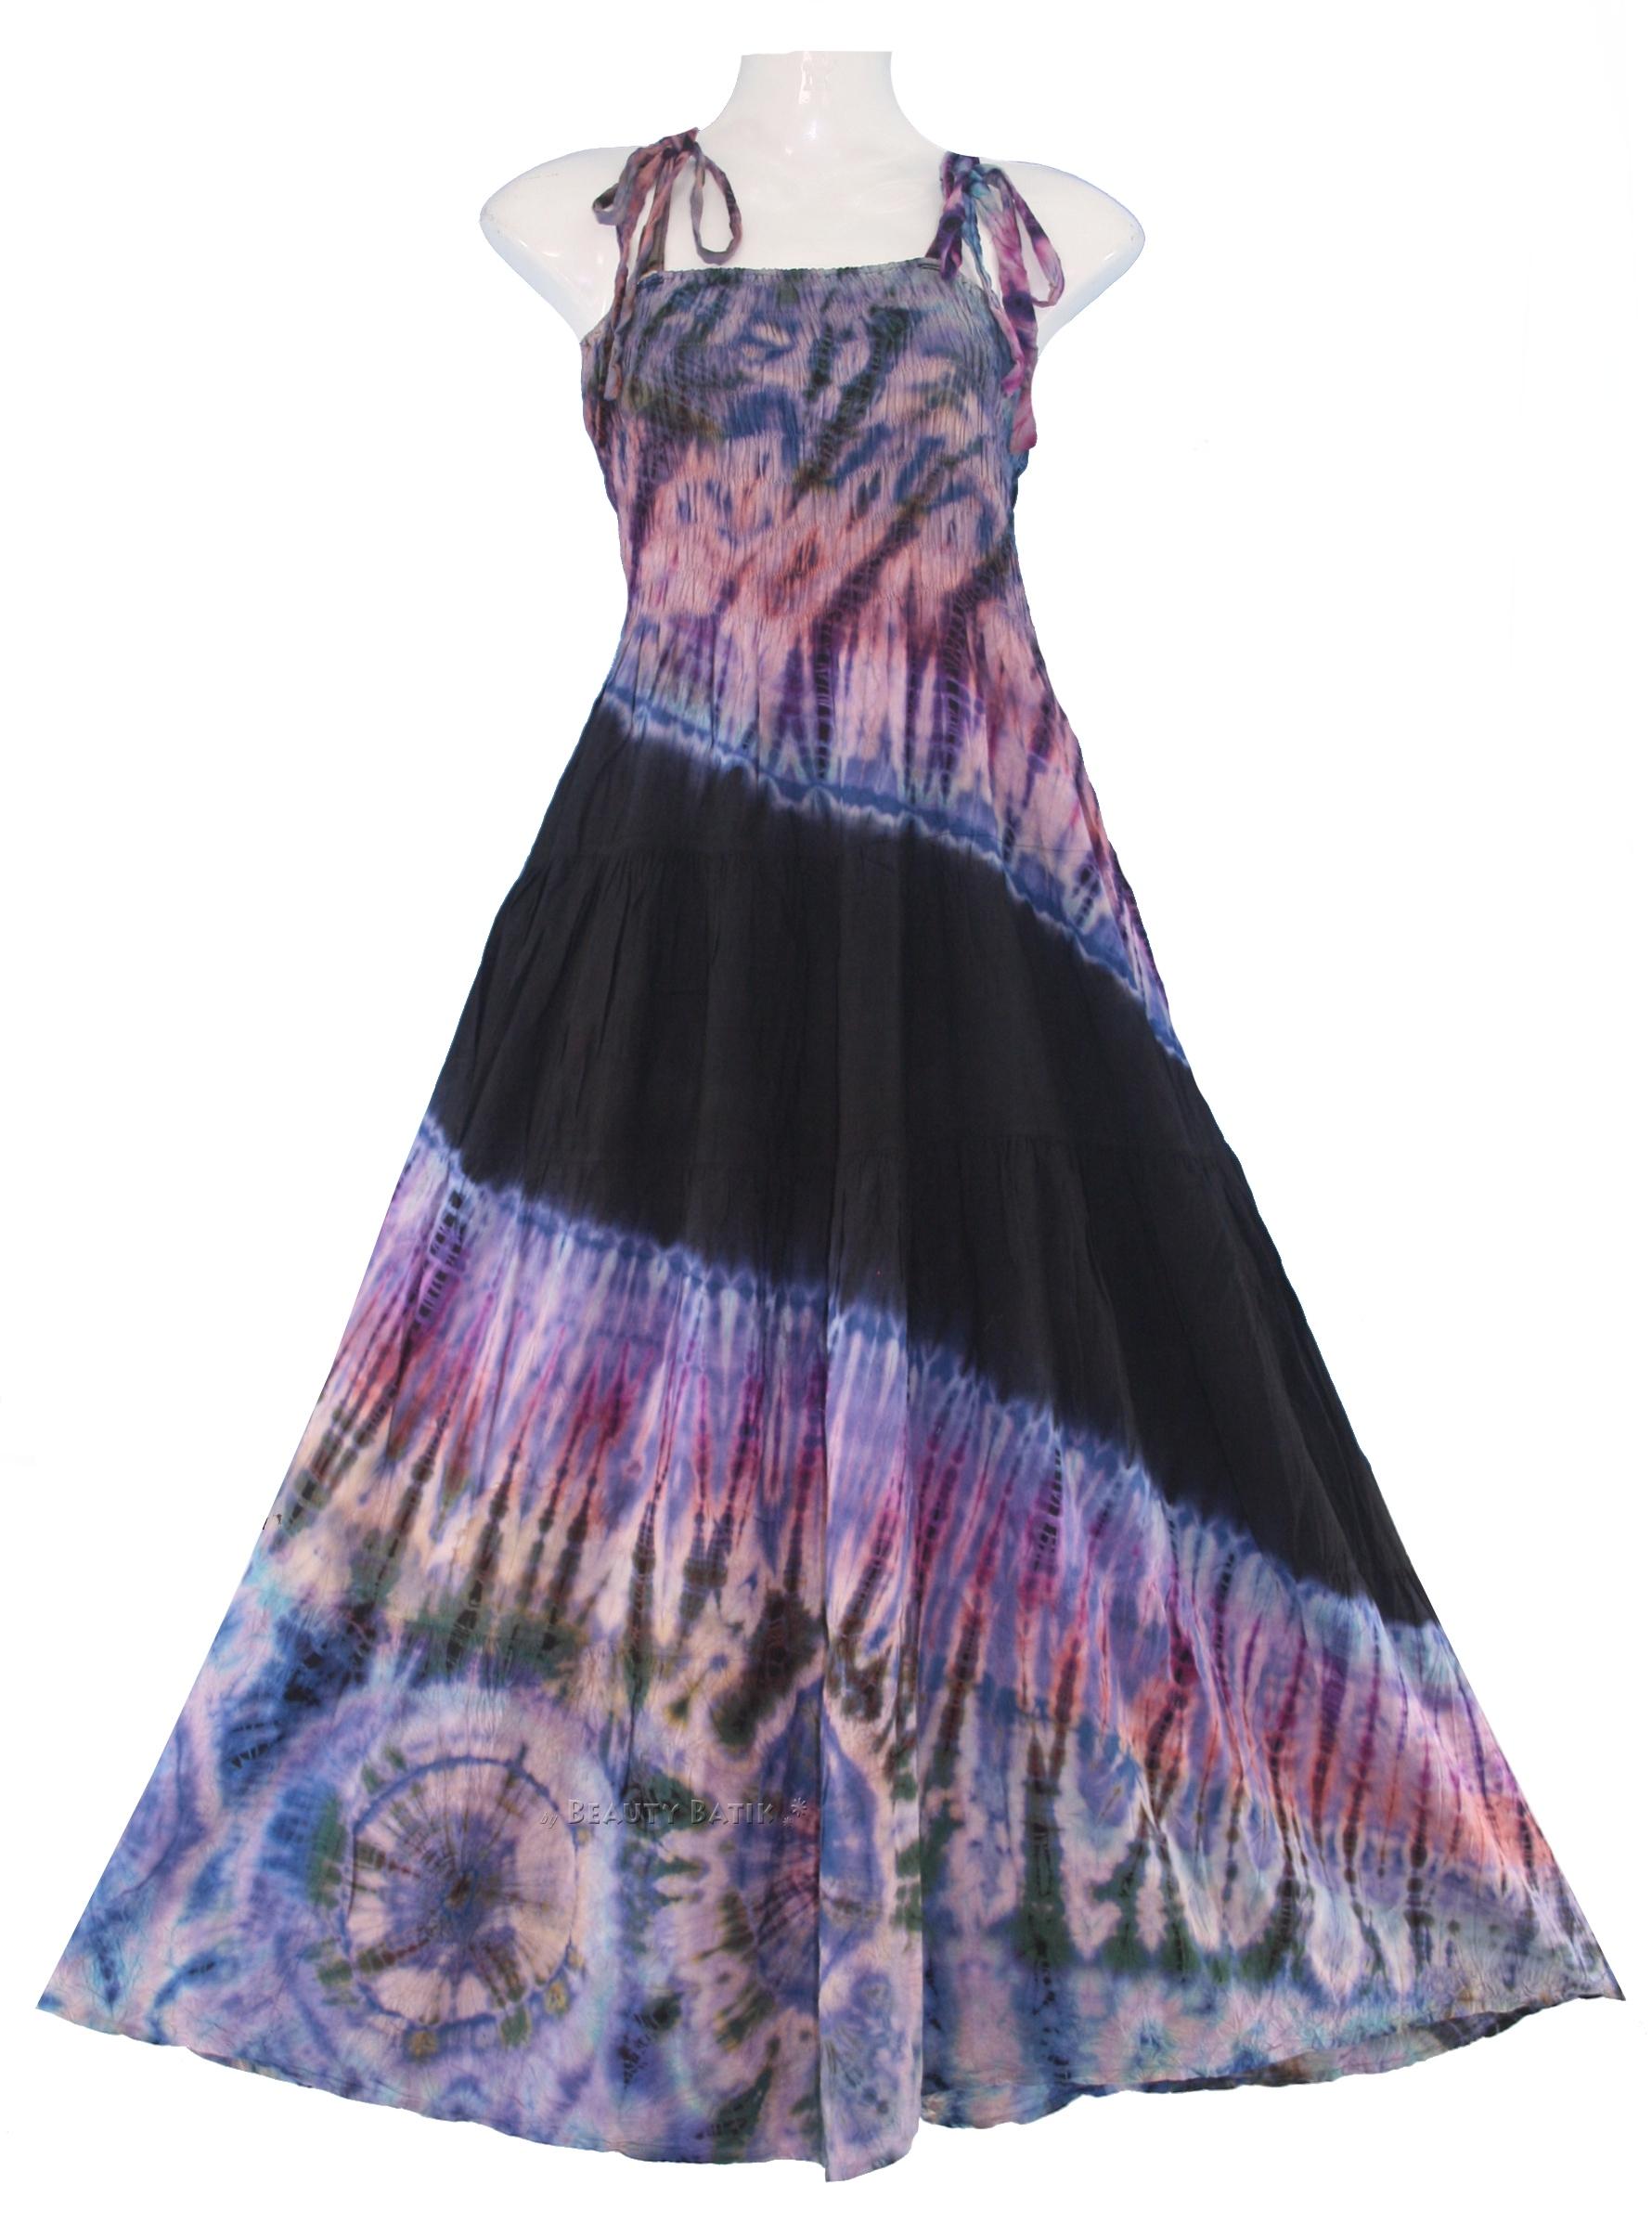 new boho hippie tie dye summer maxi sun dress sz l